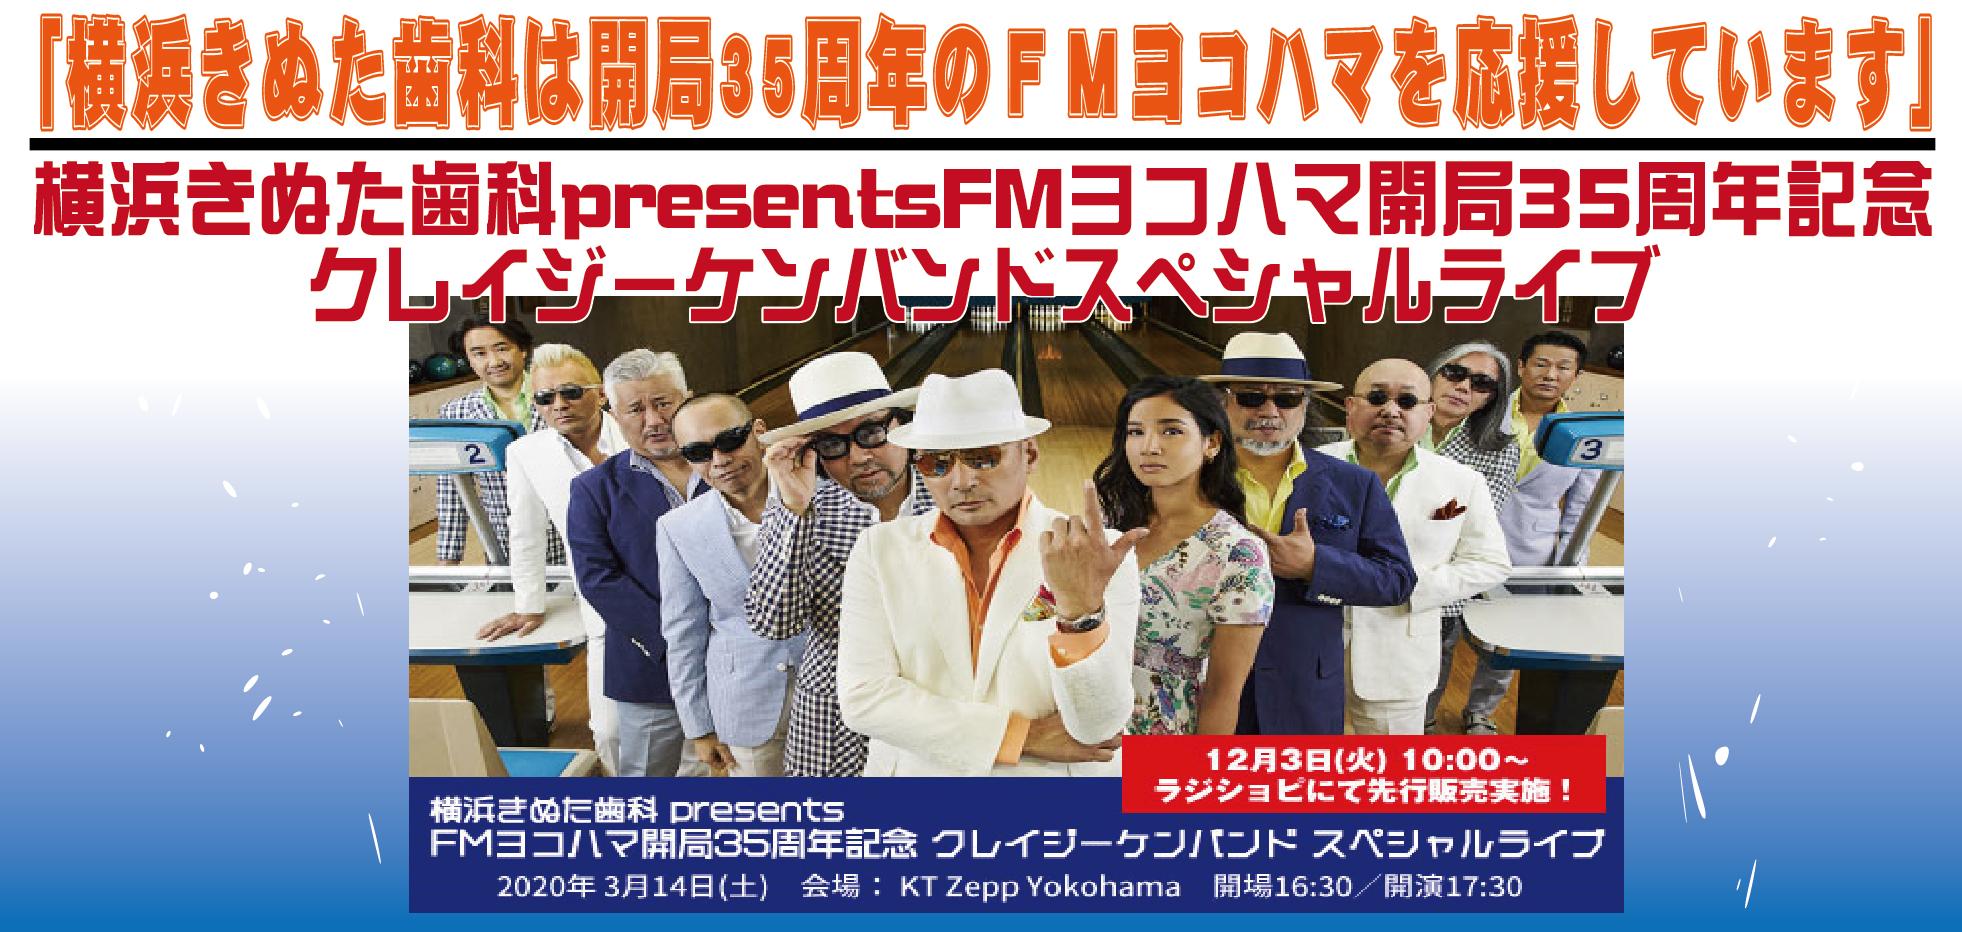 FMヨコハマ開局35周年記念クレイジーケンバンドスペシャルライブ協賛